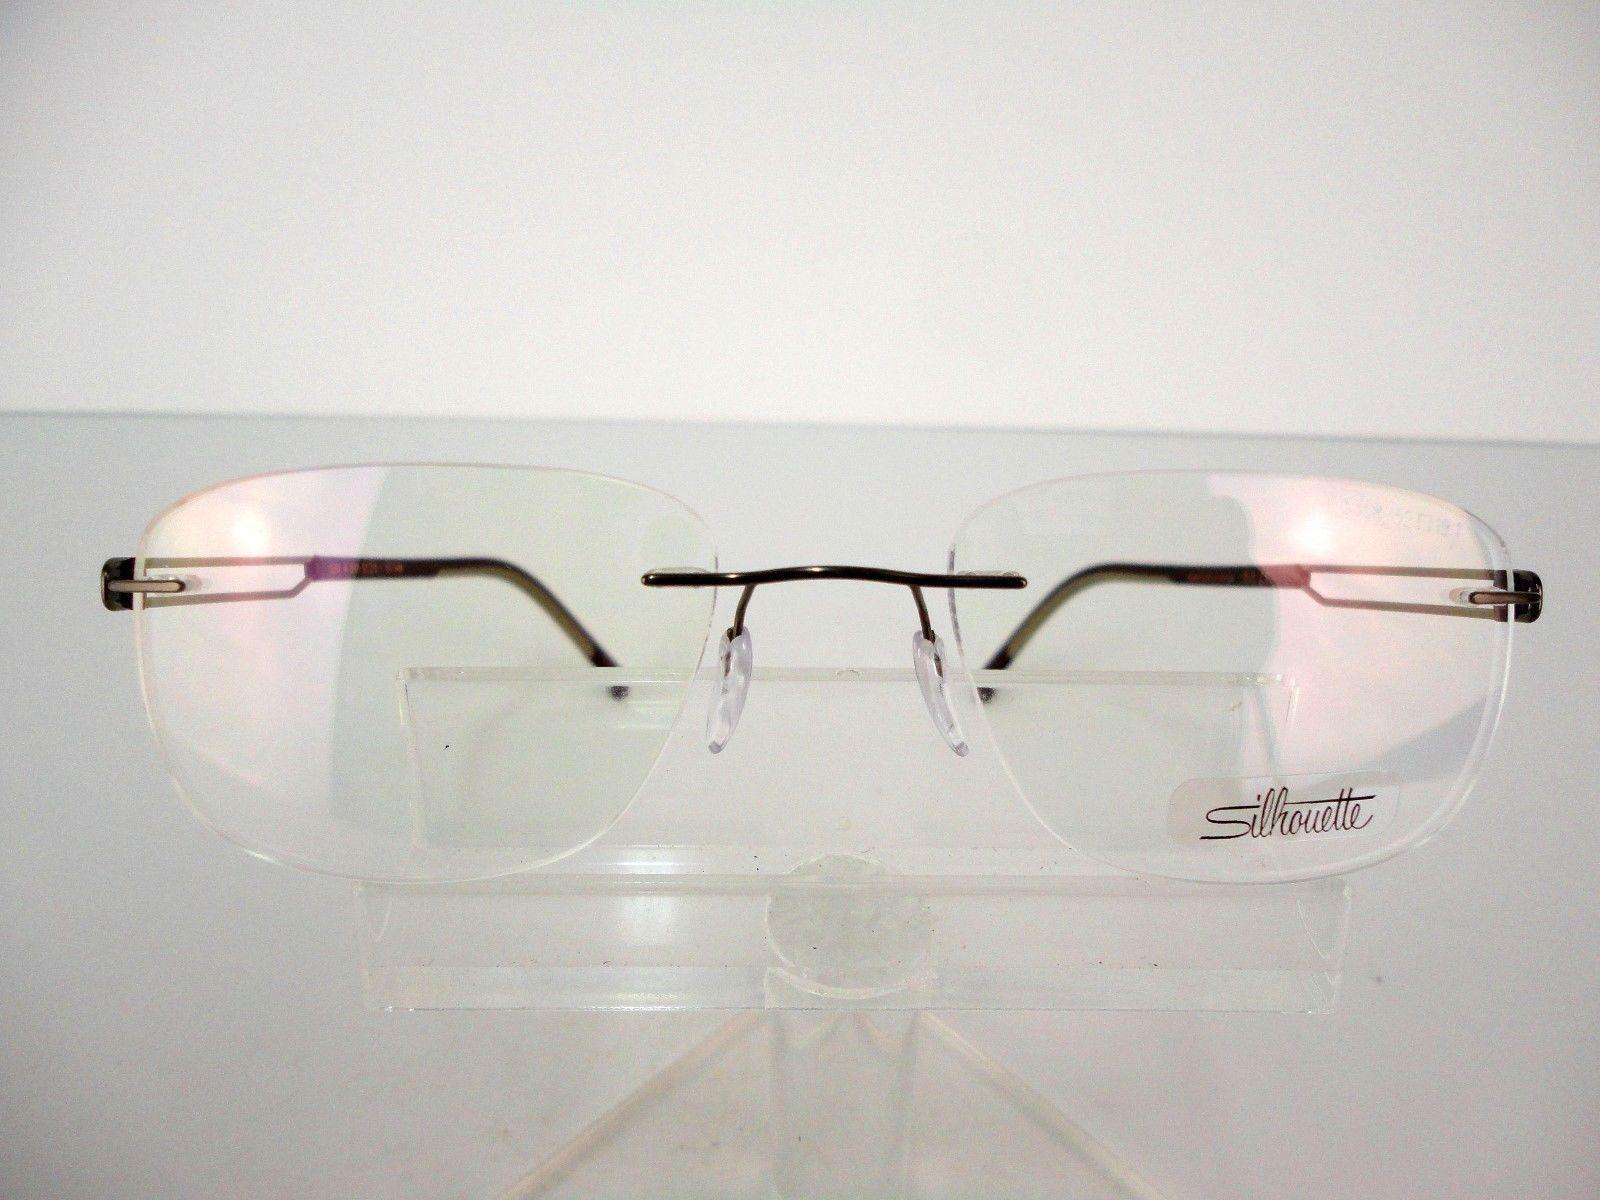 24c3a2df051 Silhouette Titan Profile 5406 6066 (Dark Brown) 52 x 19 Titanium Eyeglass  Frames